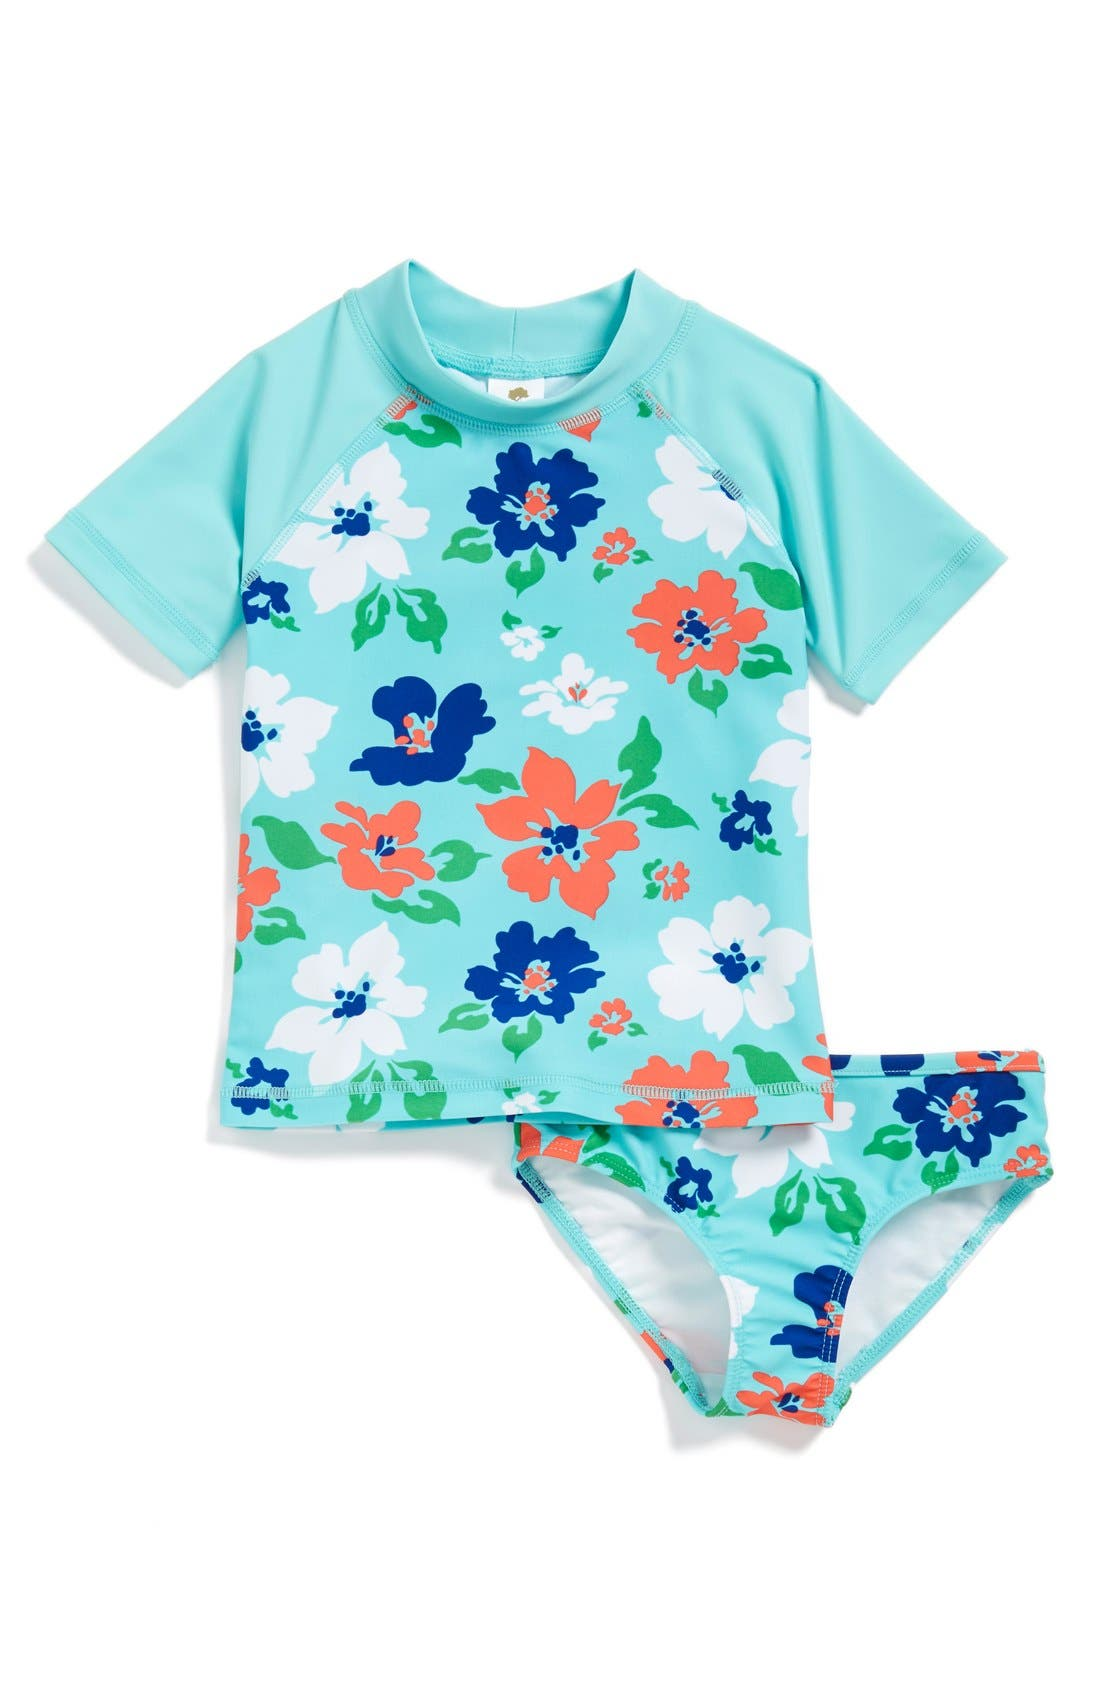 Main Image - Tucker + Tate 'Montauk' Rashguard Shirt & Bottoms (Little Girls & Big Girls)